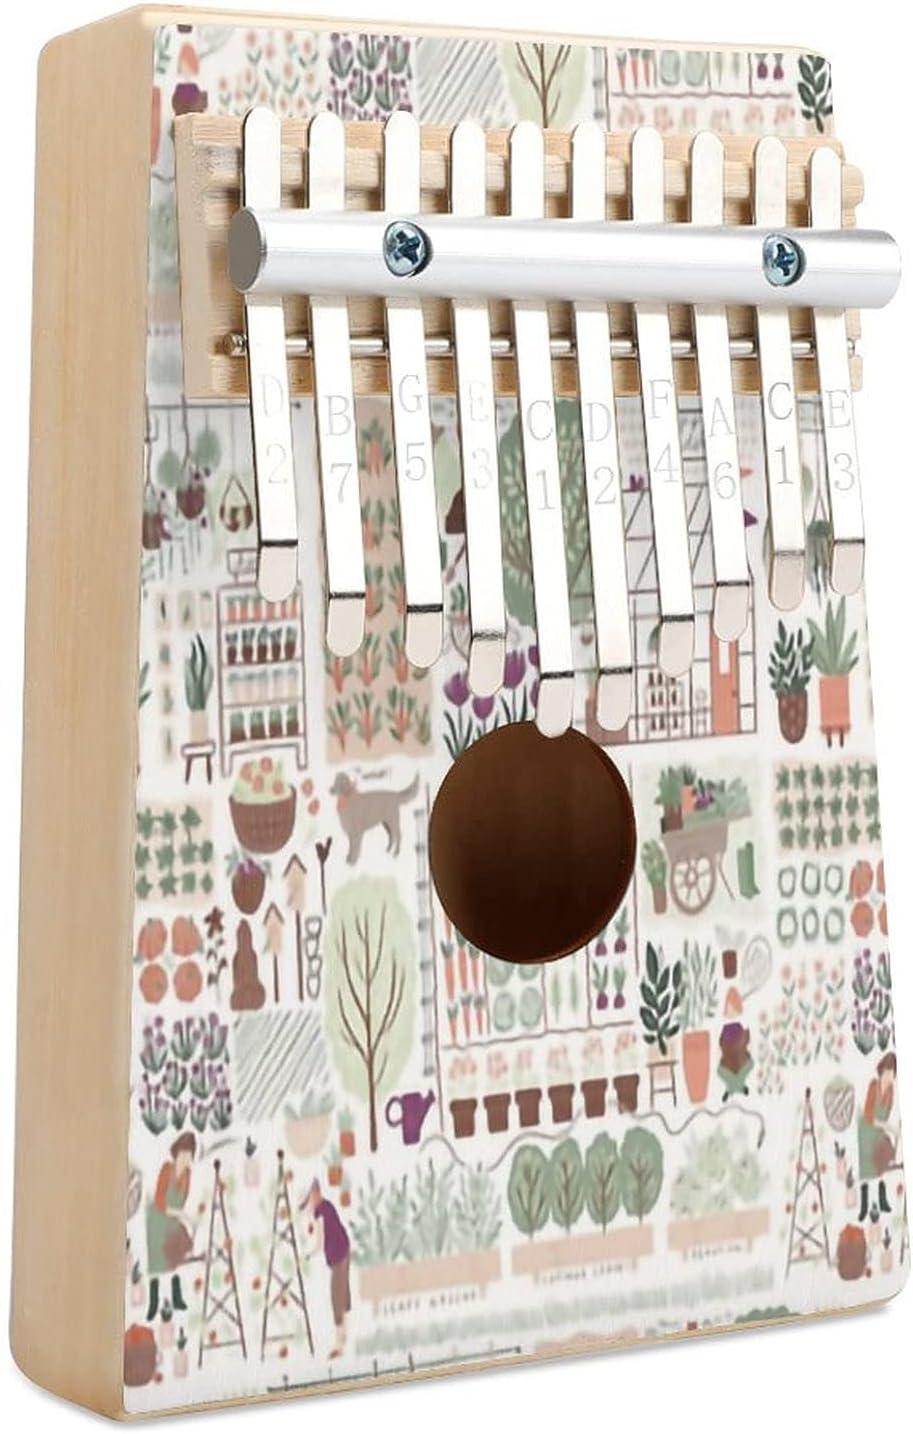 My Favouite Greenhouse Discount mail order San Jose Mall Kalimba Thumb M Piano 10 Finger Key